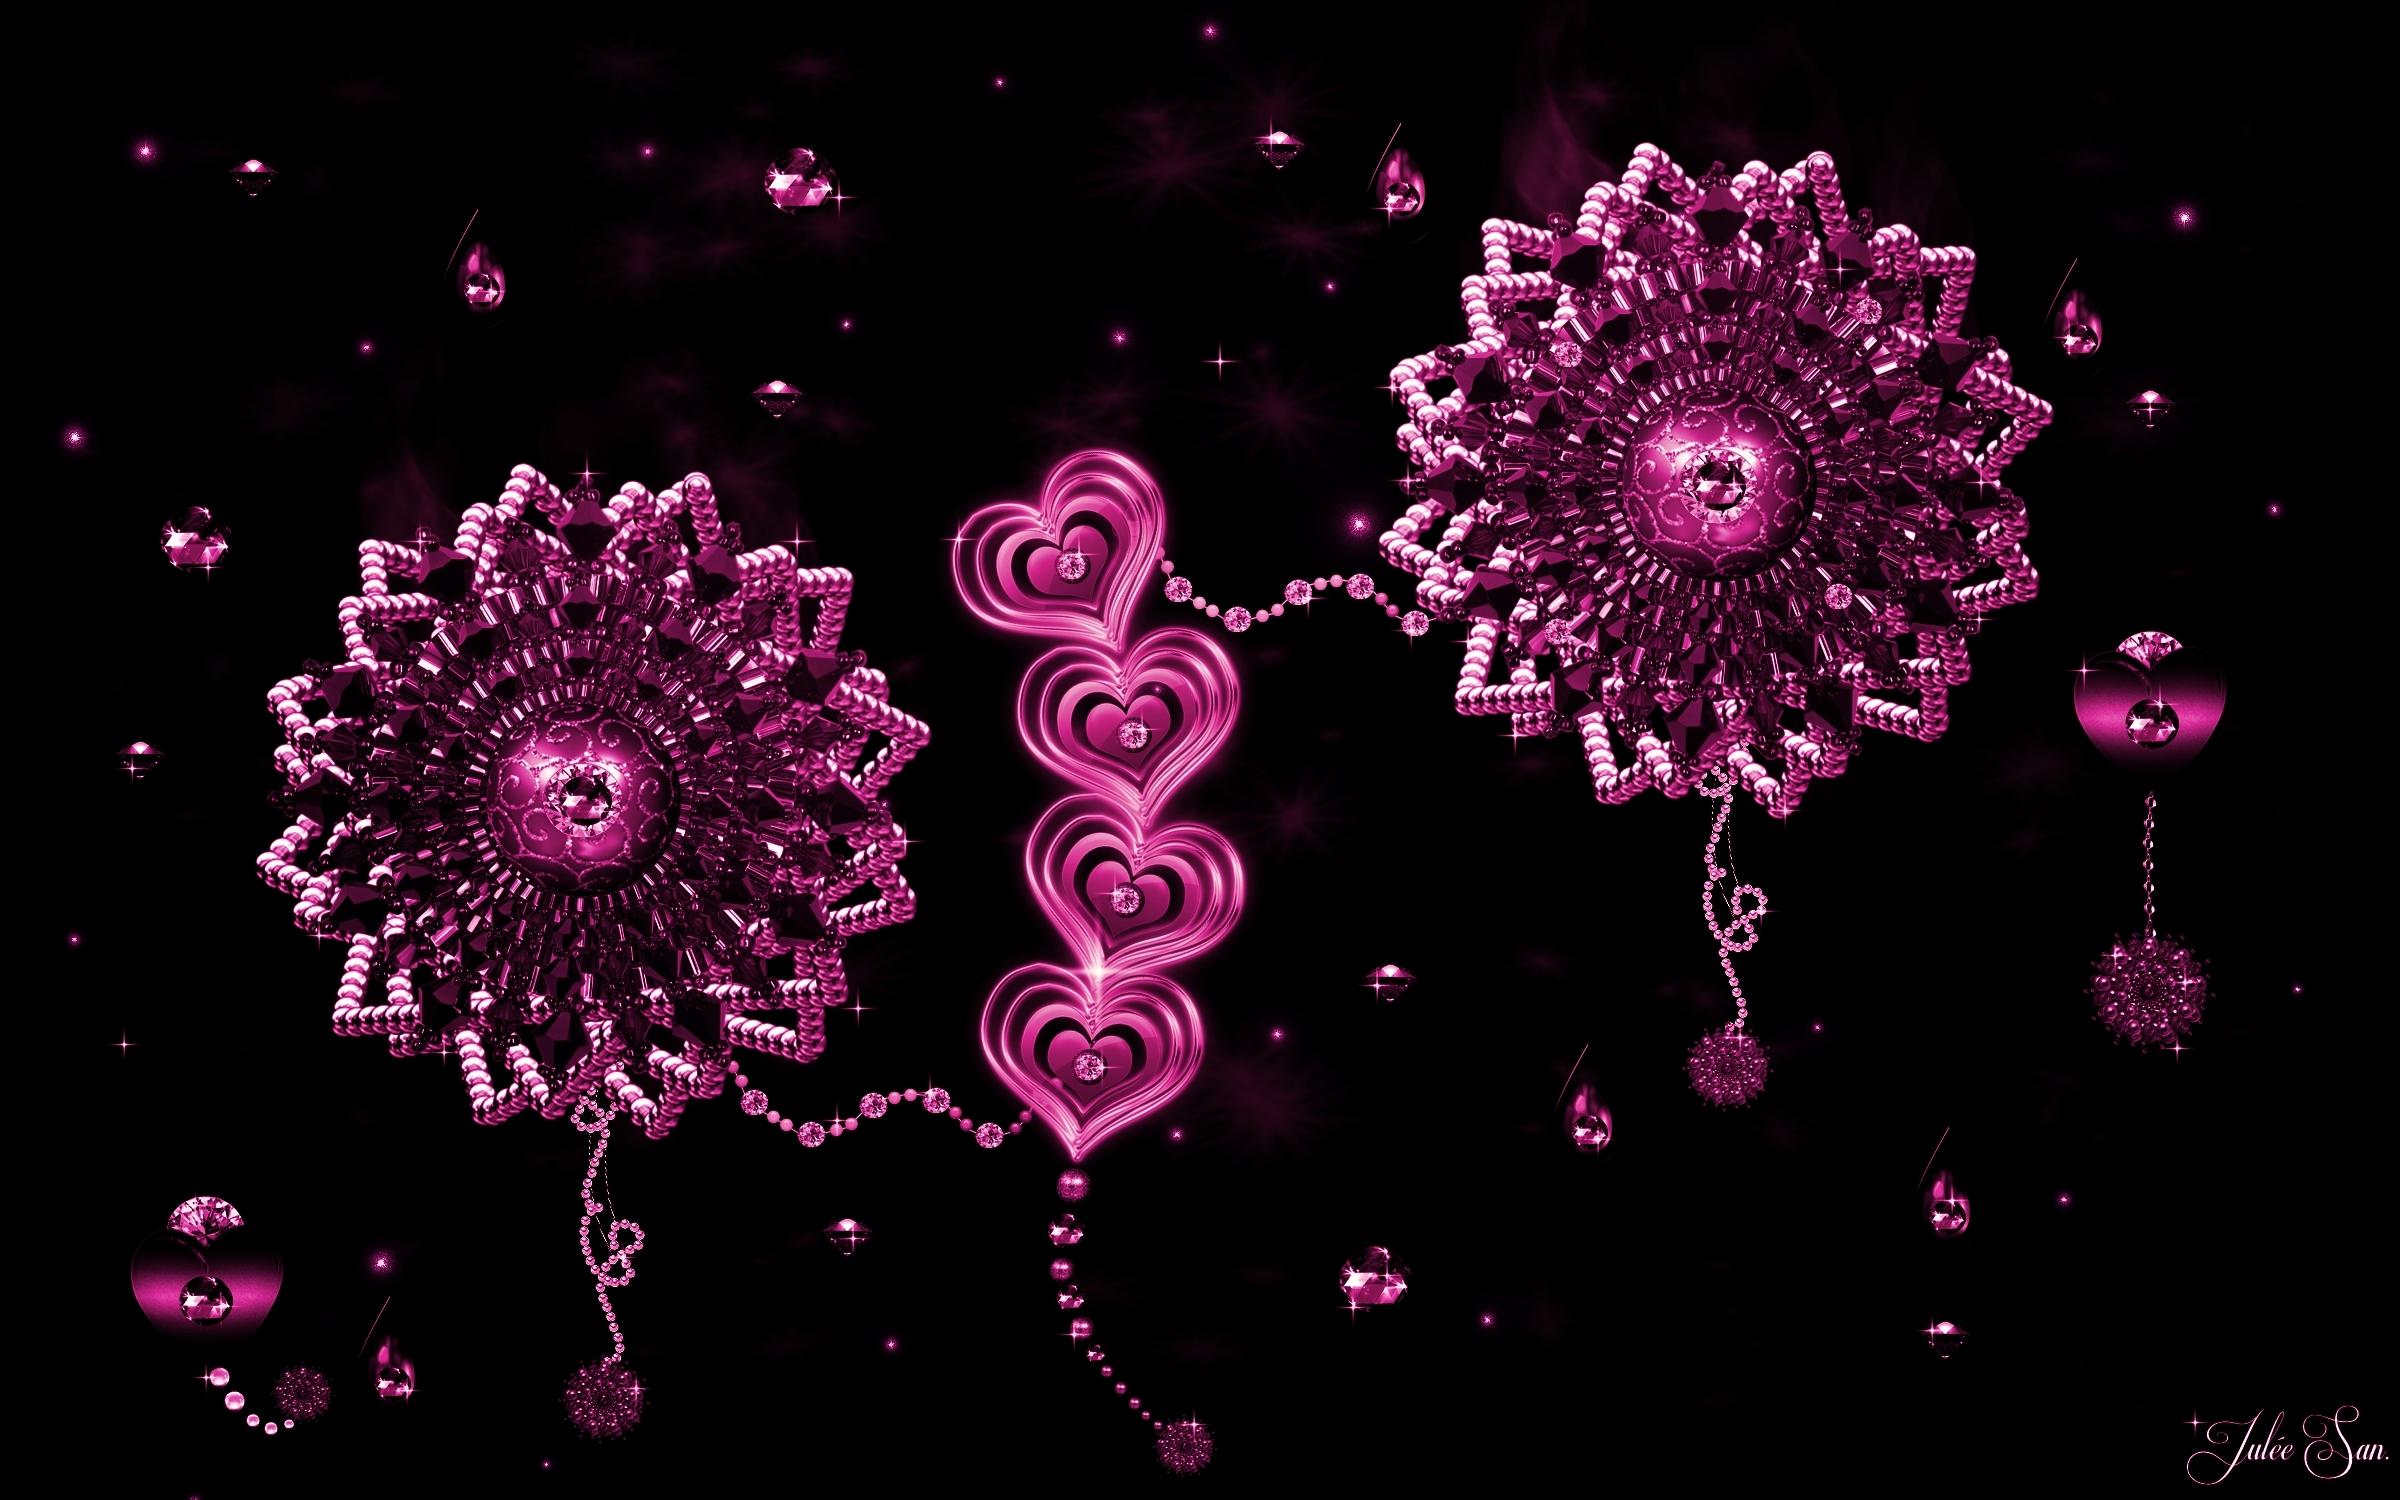 Love Pink Wallpaper Hd: Pink Love Wallpaper